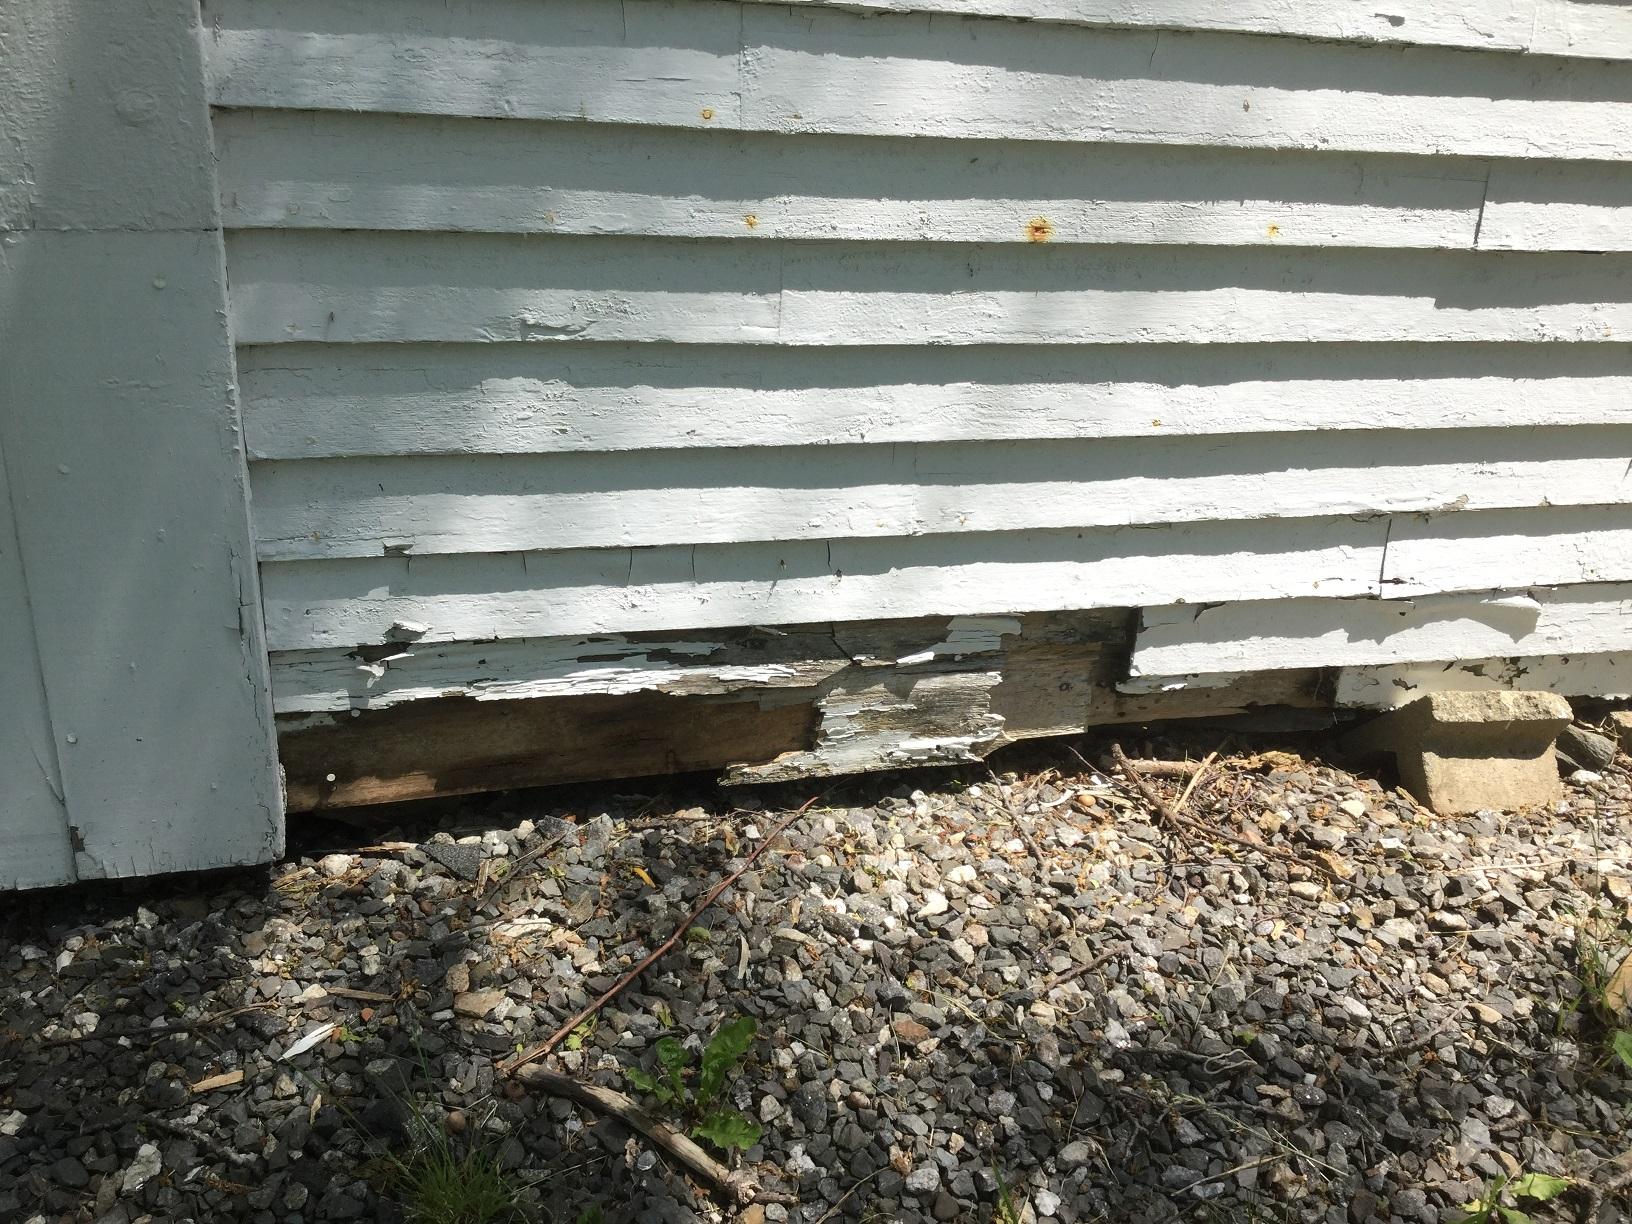 Cape Elizabeth 1 Wheeler Road Damage 4.JPG